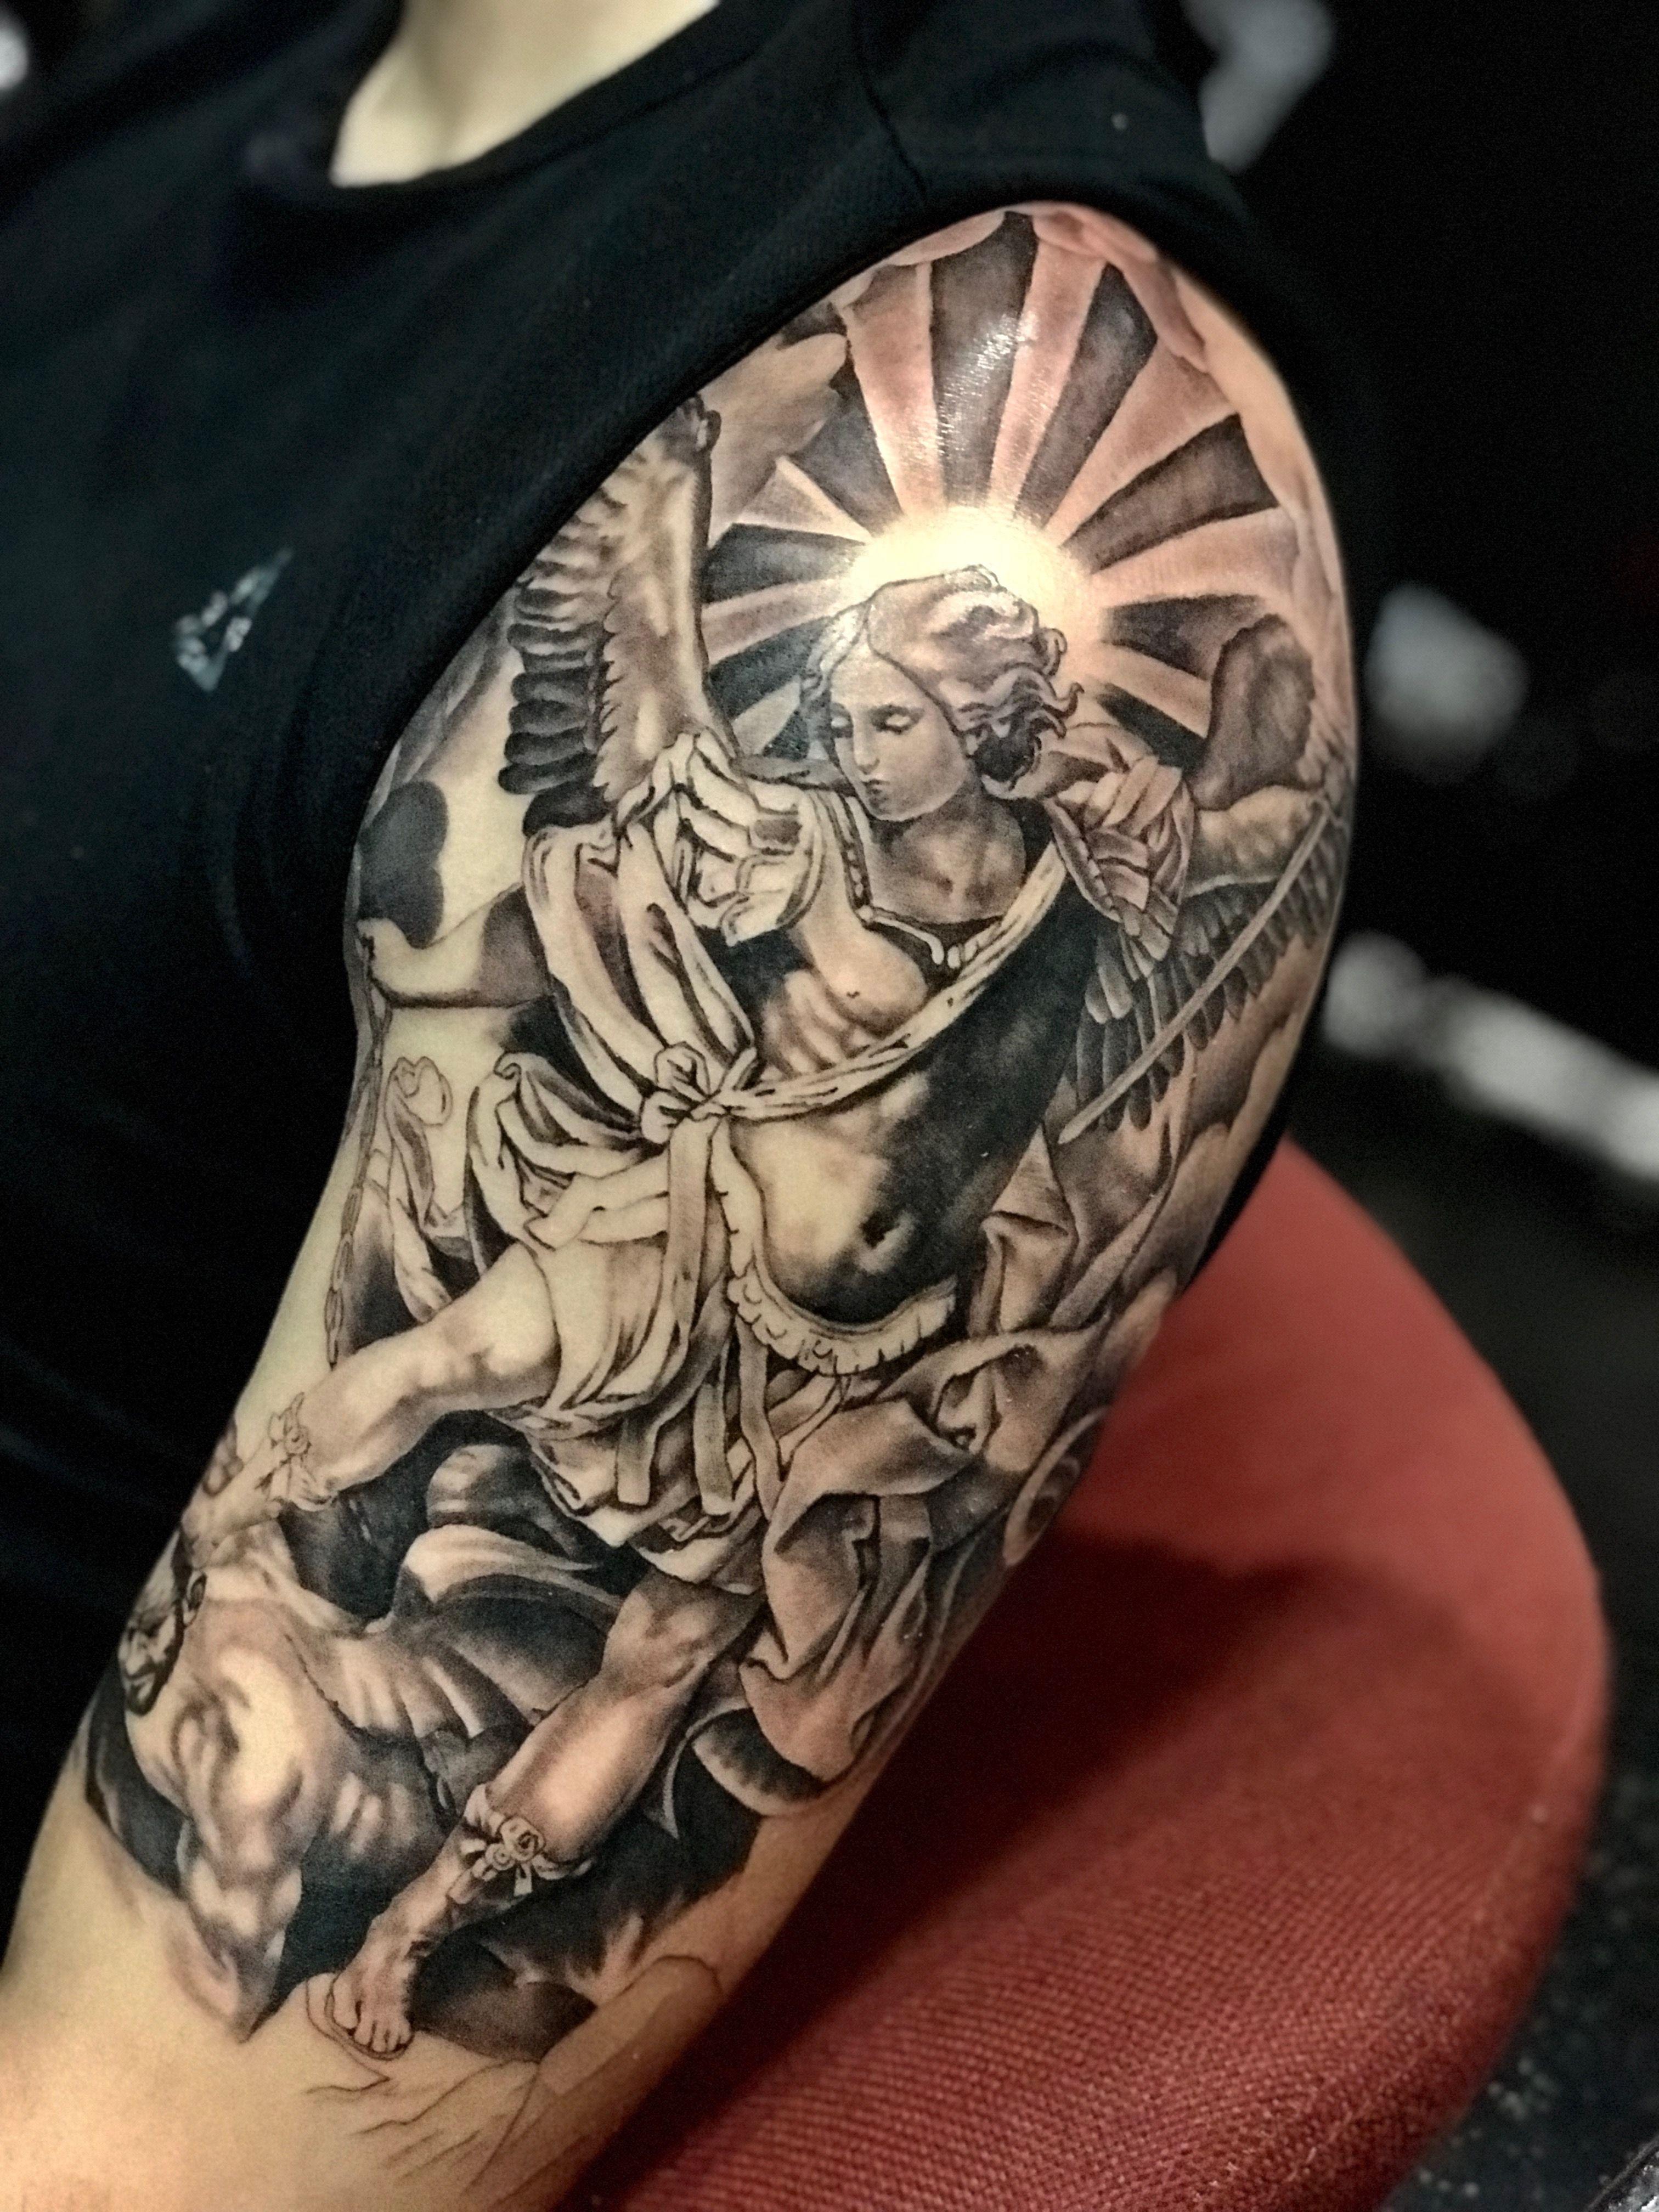 San Miguel Arcangel Tattoo Bae Archangel Michael Tattoo St inside measurements 3024 X 4032